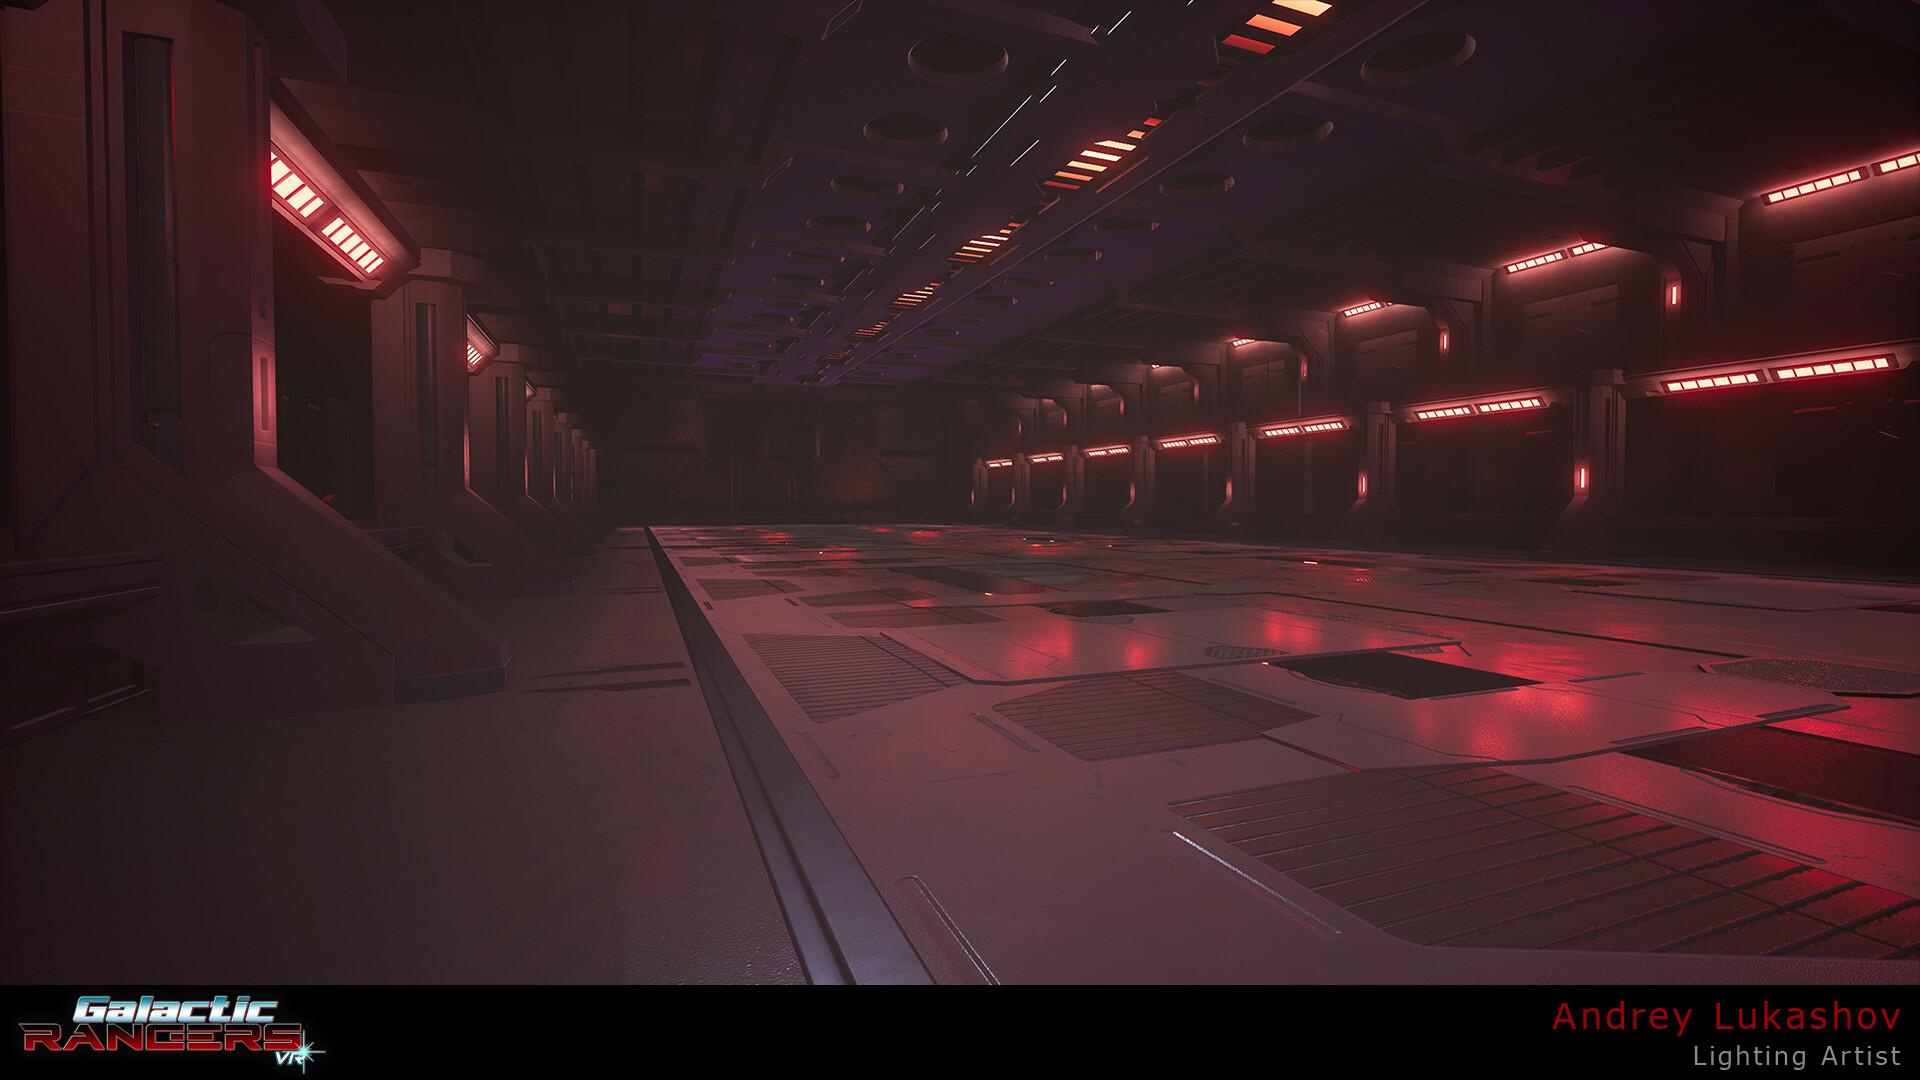 Andrey lukashov hangar lightred 02